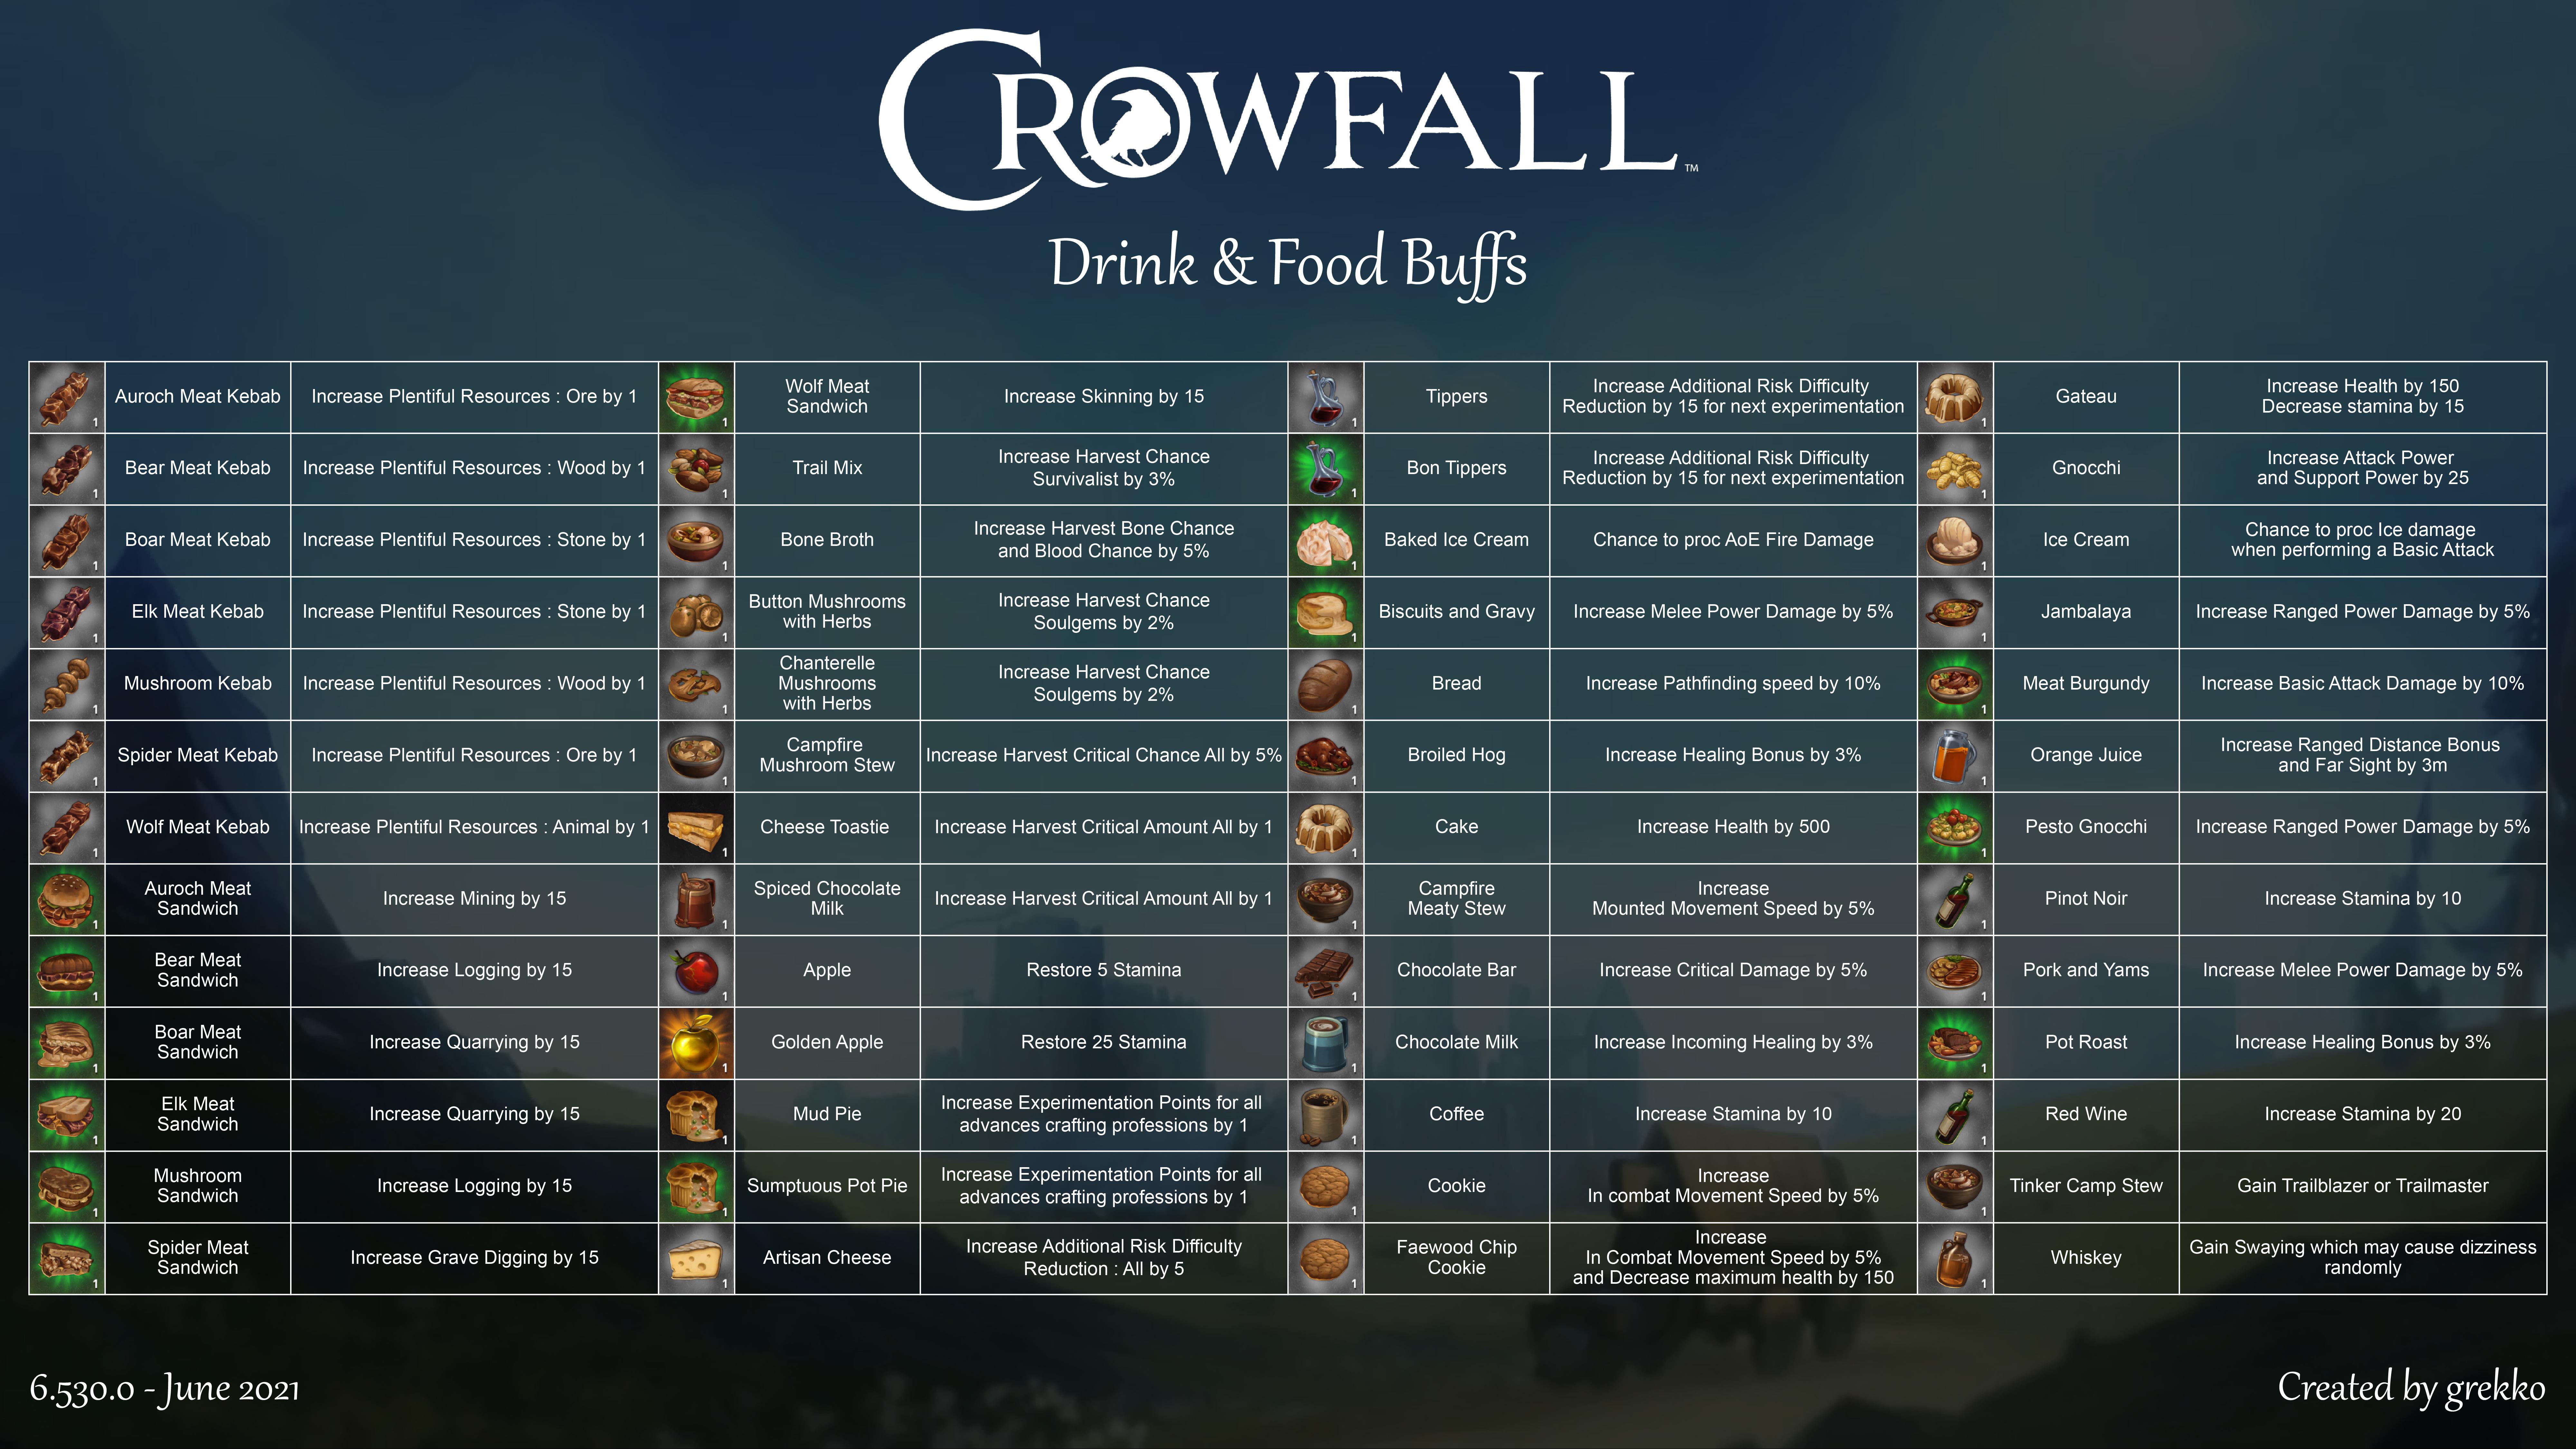 Drink__Food_Buffs_6.530_June_2021.png